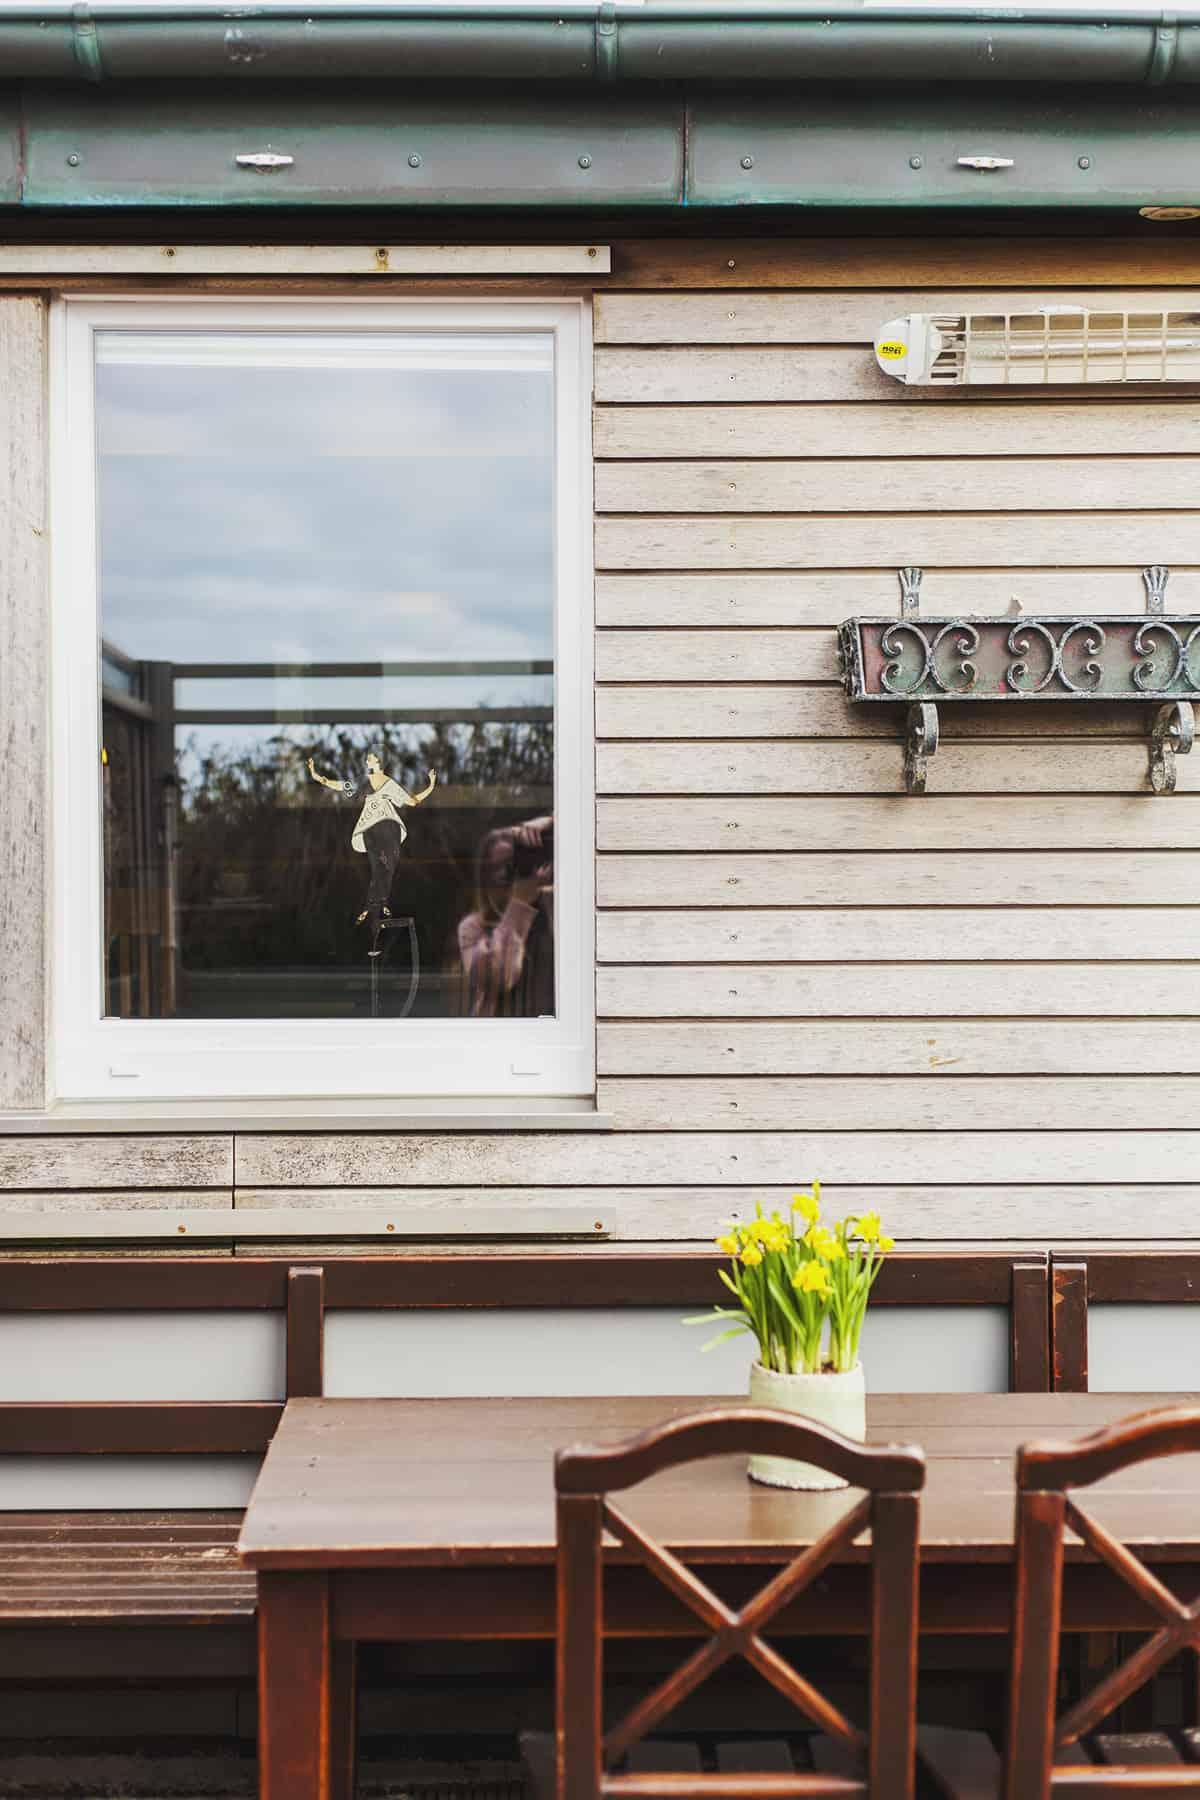 Strandrestaurant Samoa Seepferdchen Terrasse